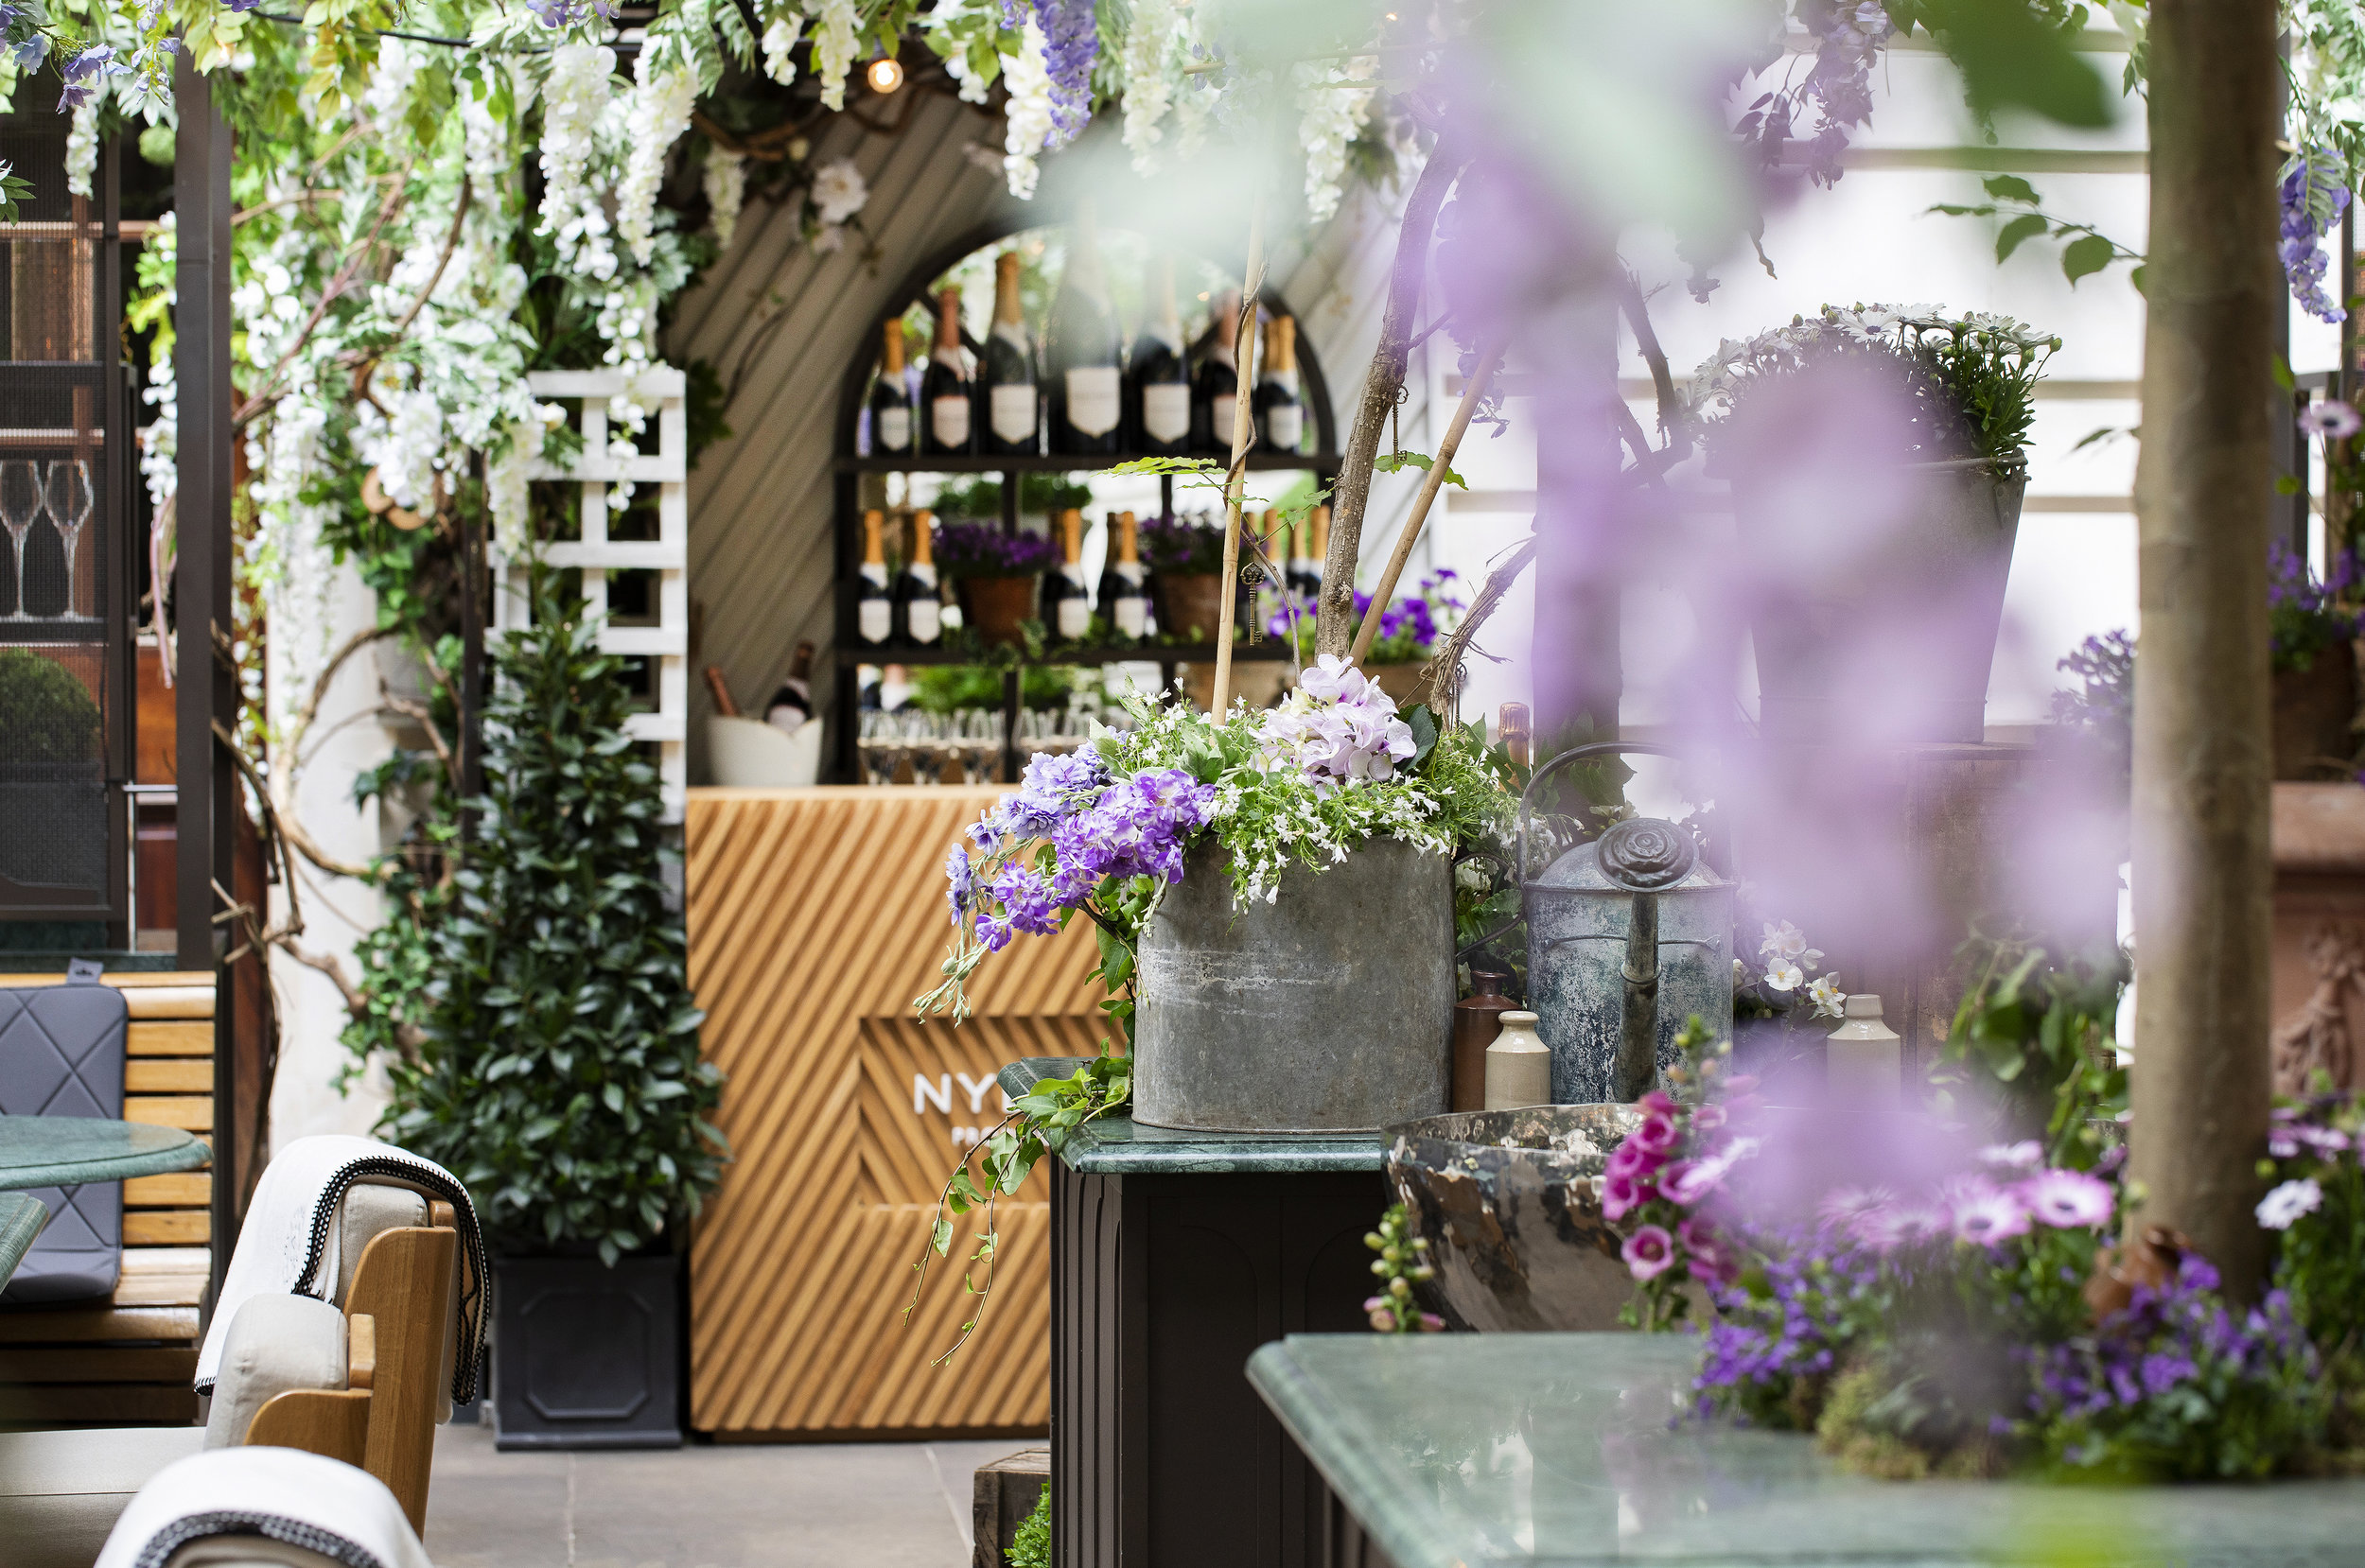 Holborn Dining Room_The Nyetimber Secret Garden_Bar_©John Carey (5).jpg